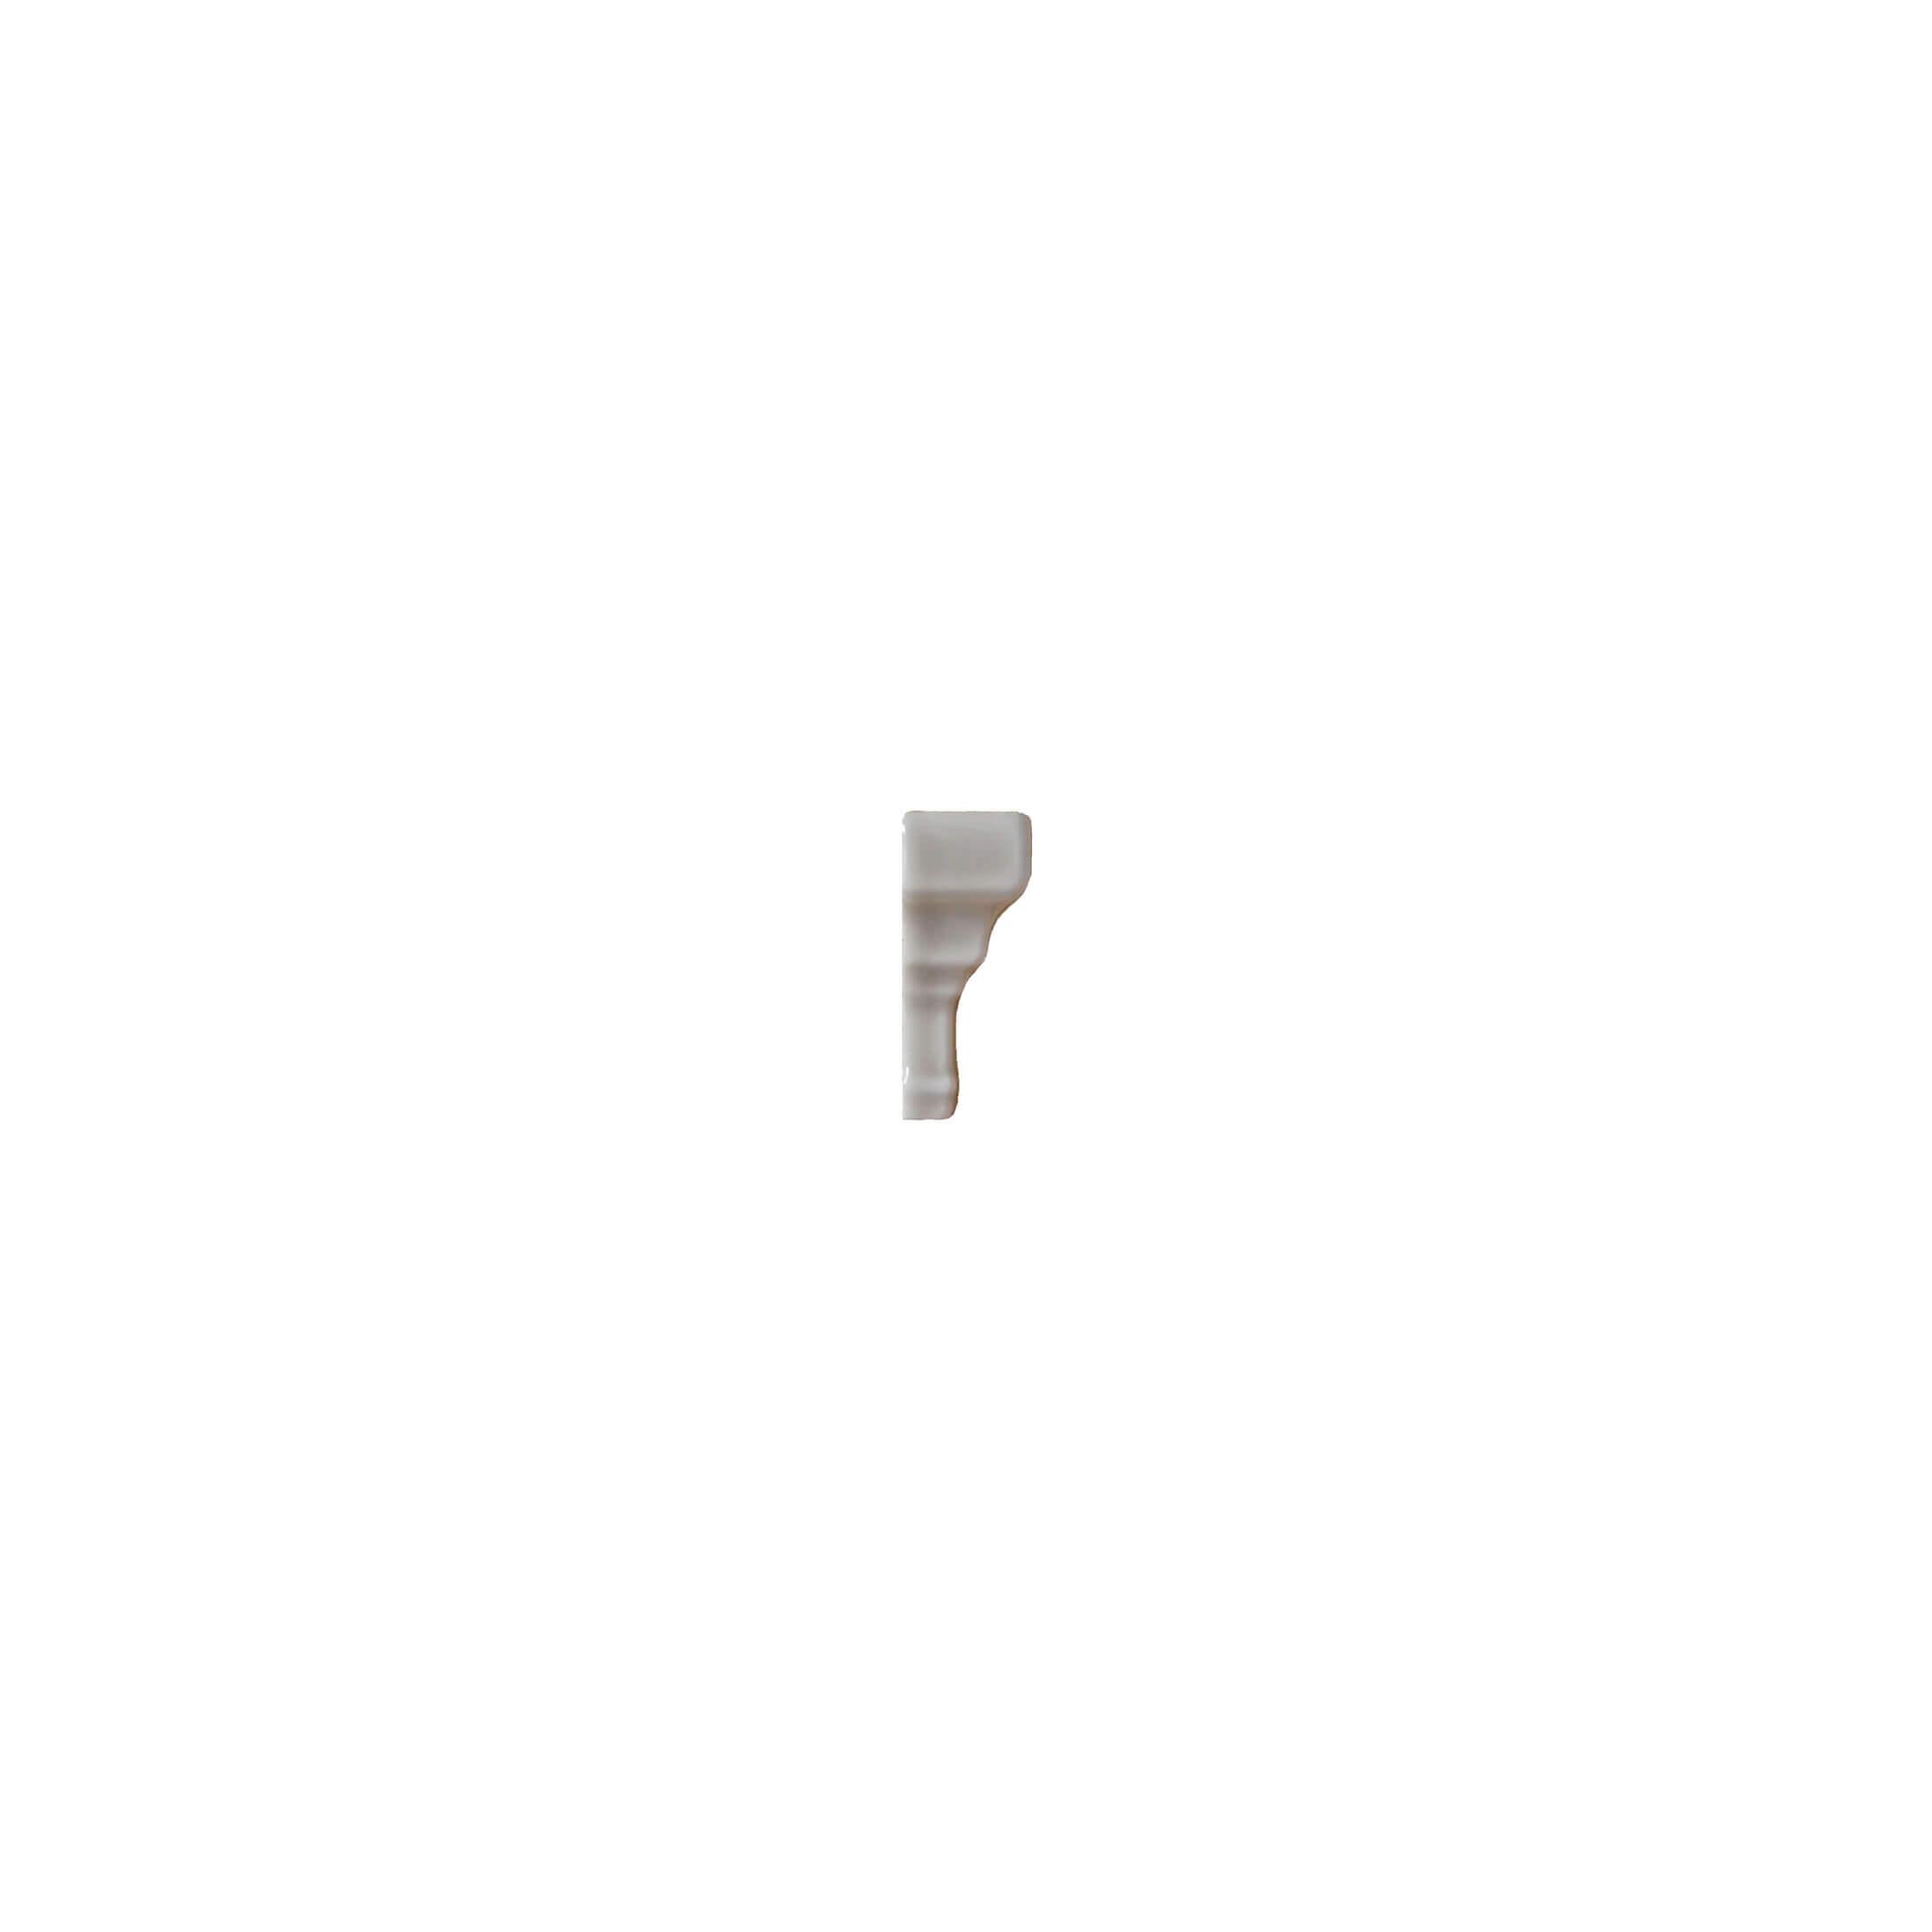 ADEX-ADST5298-ANGULO-EXTERIOR CORNISA  -5 cm-19.8 cm-STUDIO>GRAYSTONE